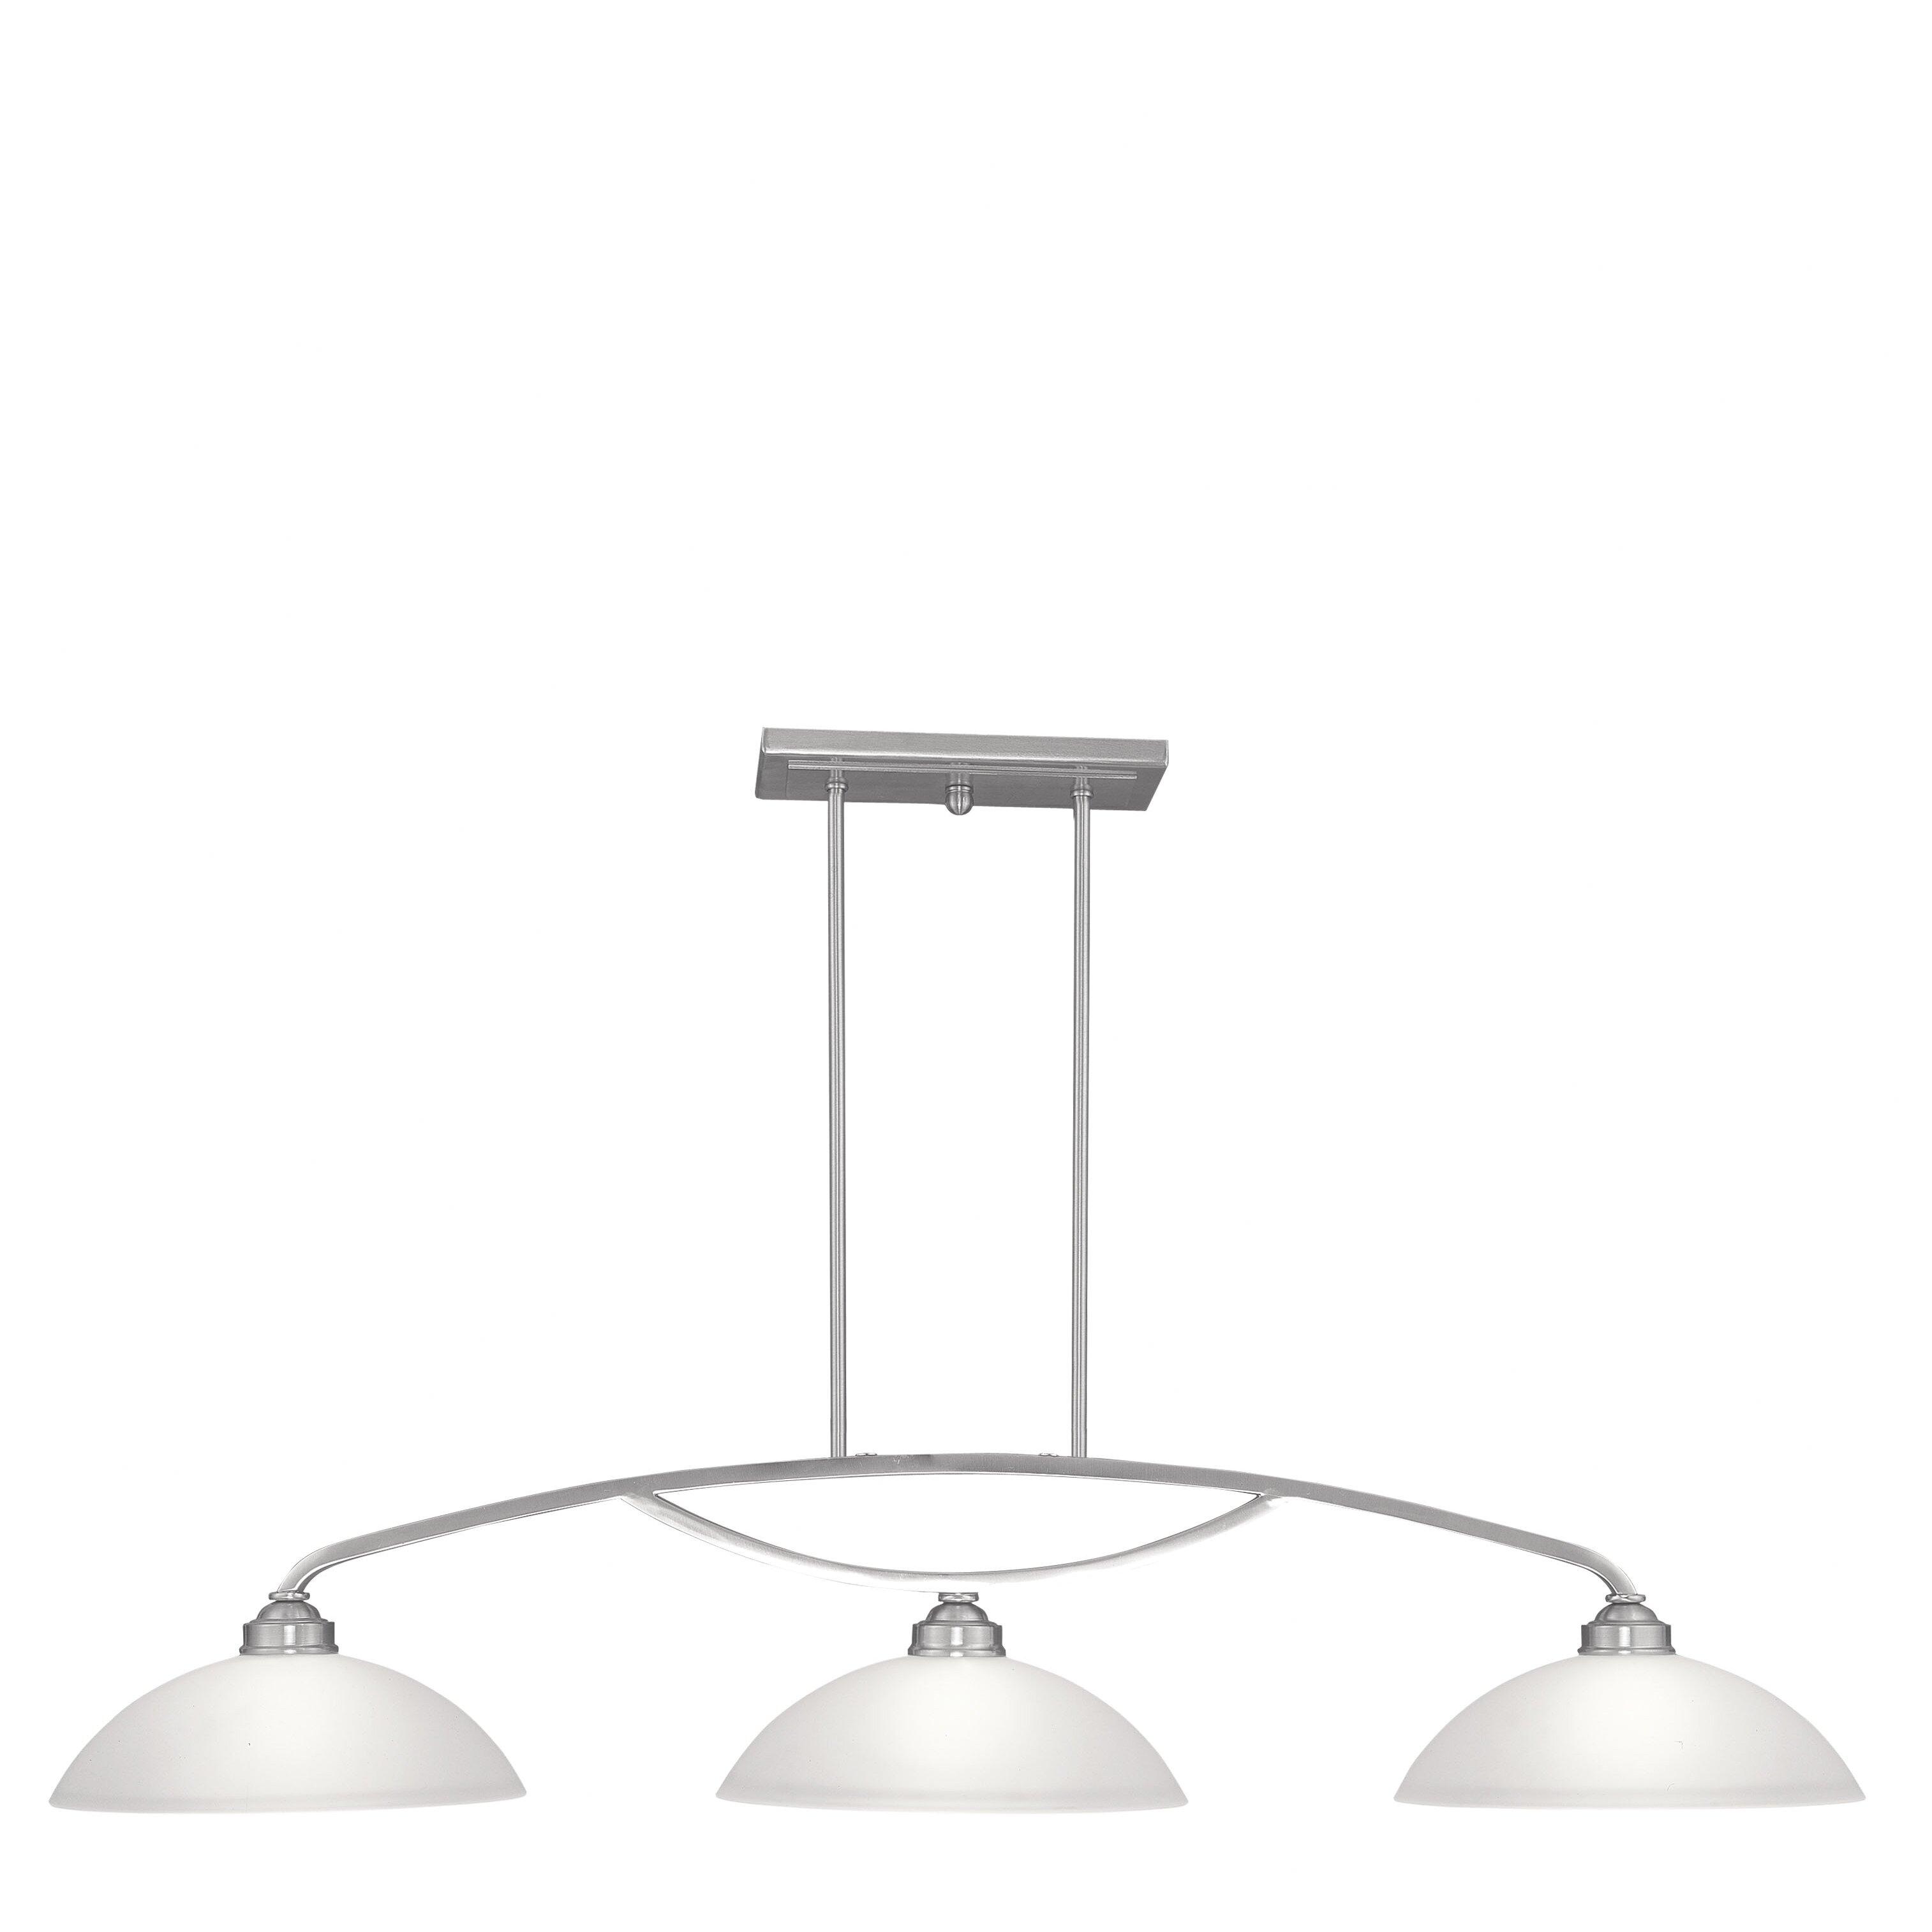 3 Light Pendant Island Kitchen Lighting: Livex Lighting Somerset 3 Light Kitchen Island Pendant